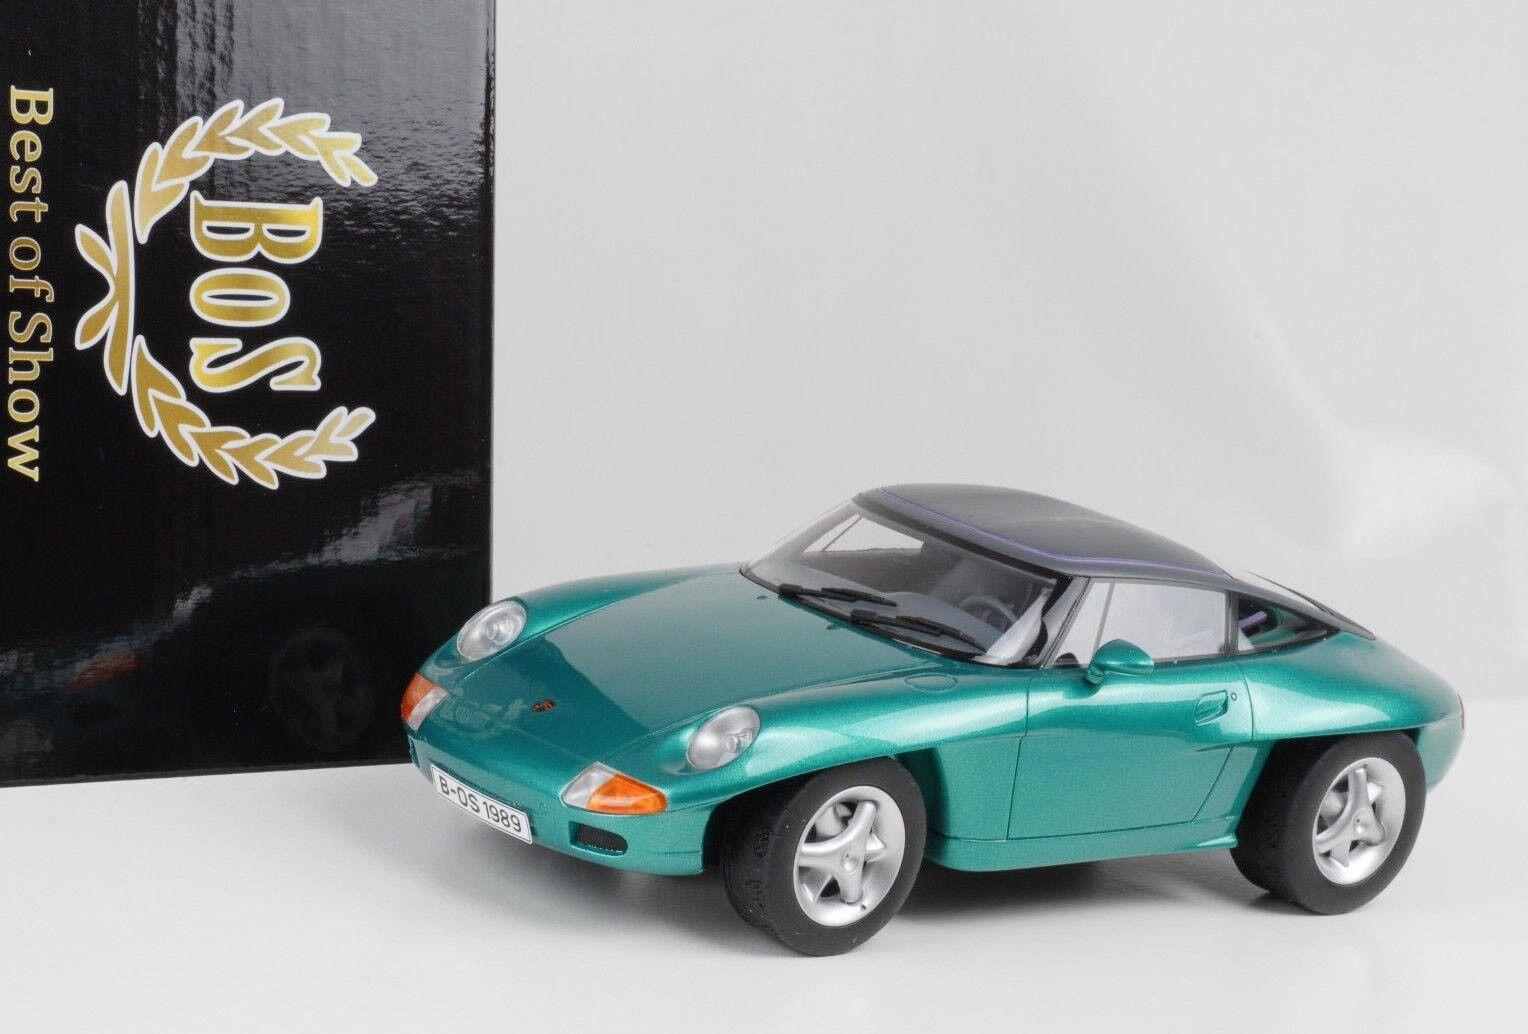 1989 Porsche 911 Pan Americana Concept Car Iaa Frankfurt 1 18 Bos Resina Nuevo